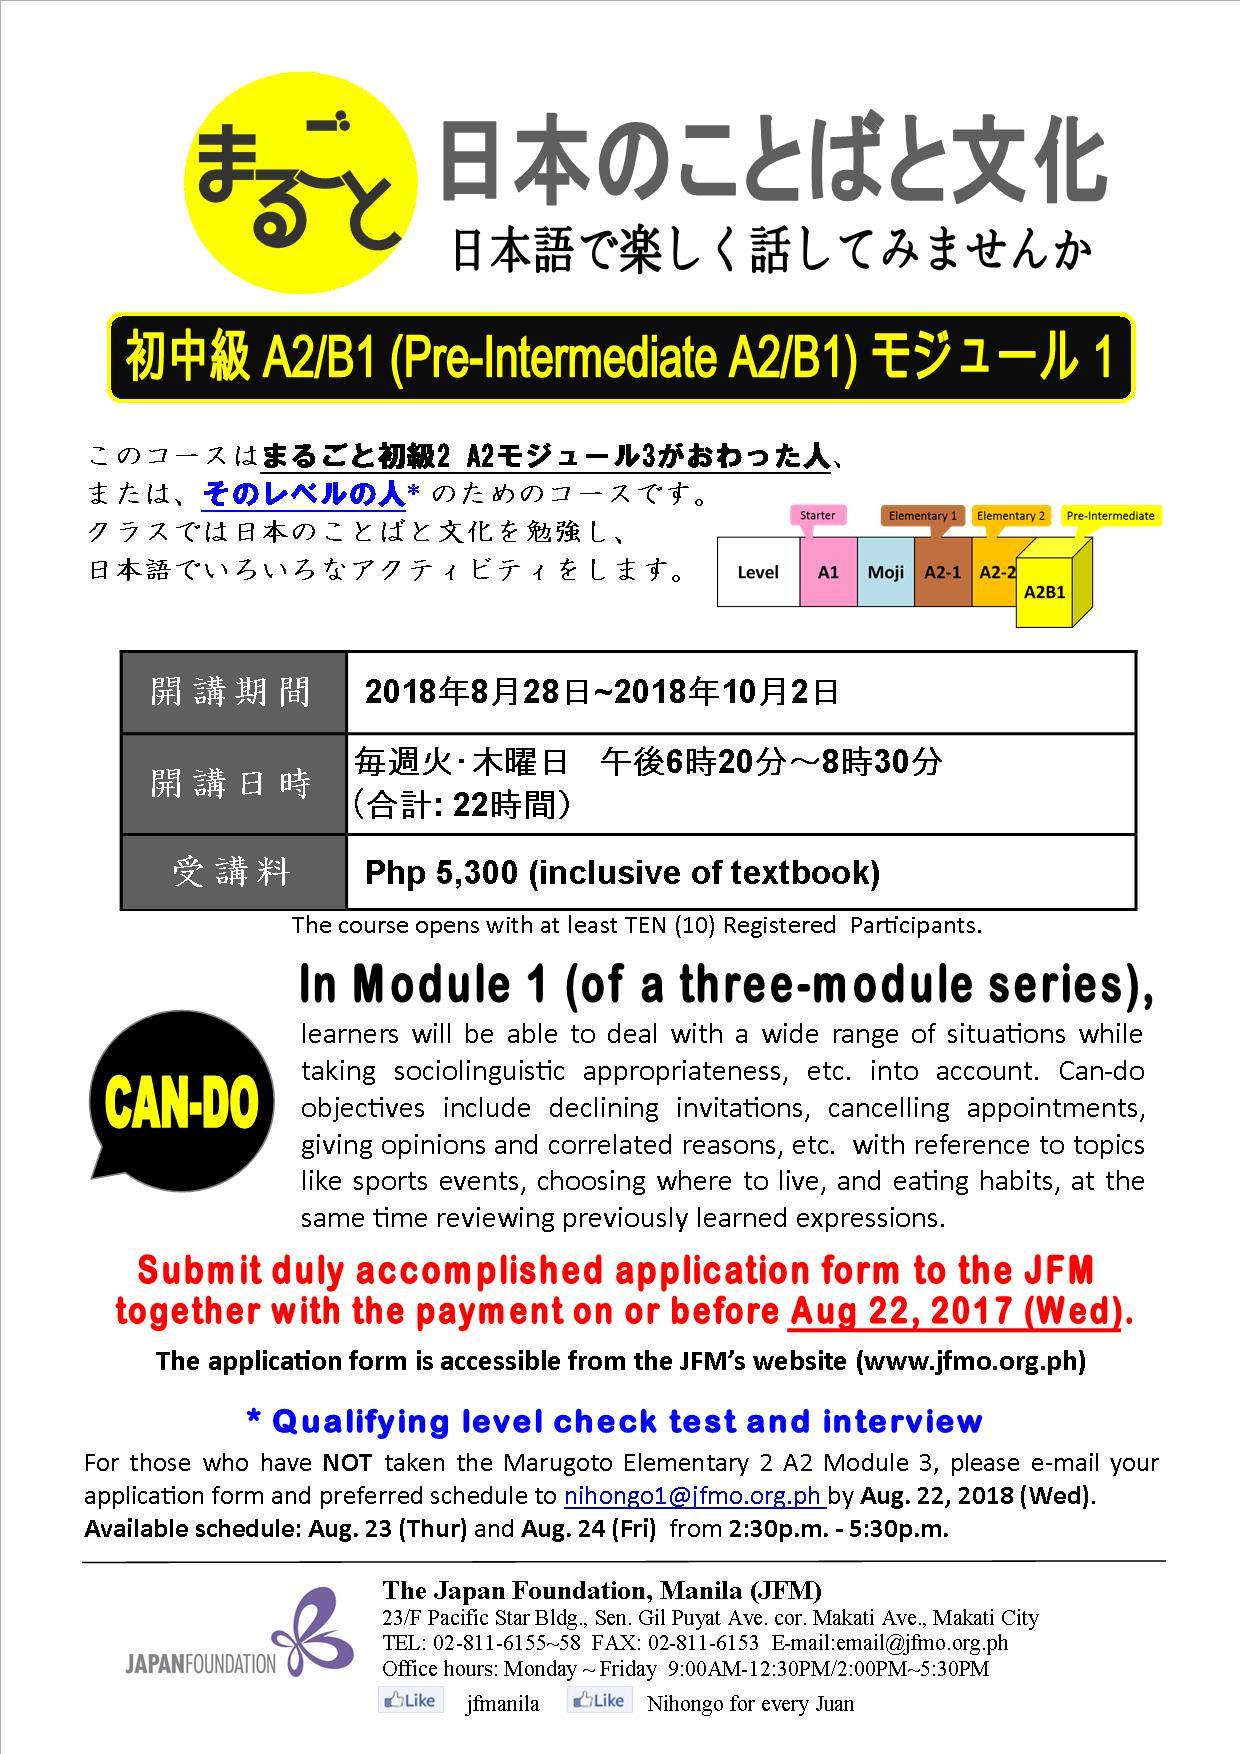 MARUGOTO Pre-Intermediate Japanese A2/B1 Module 1